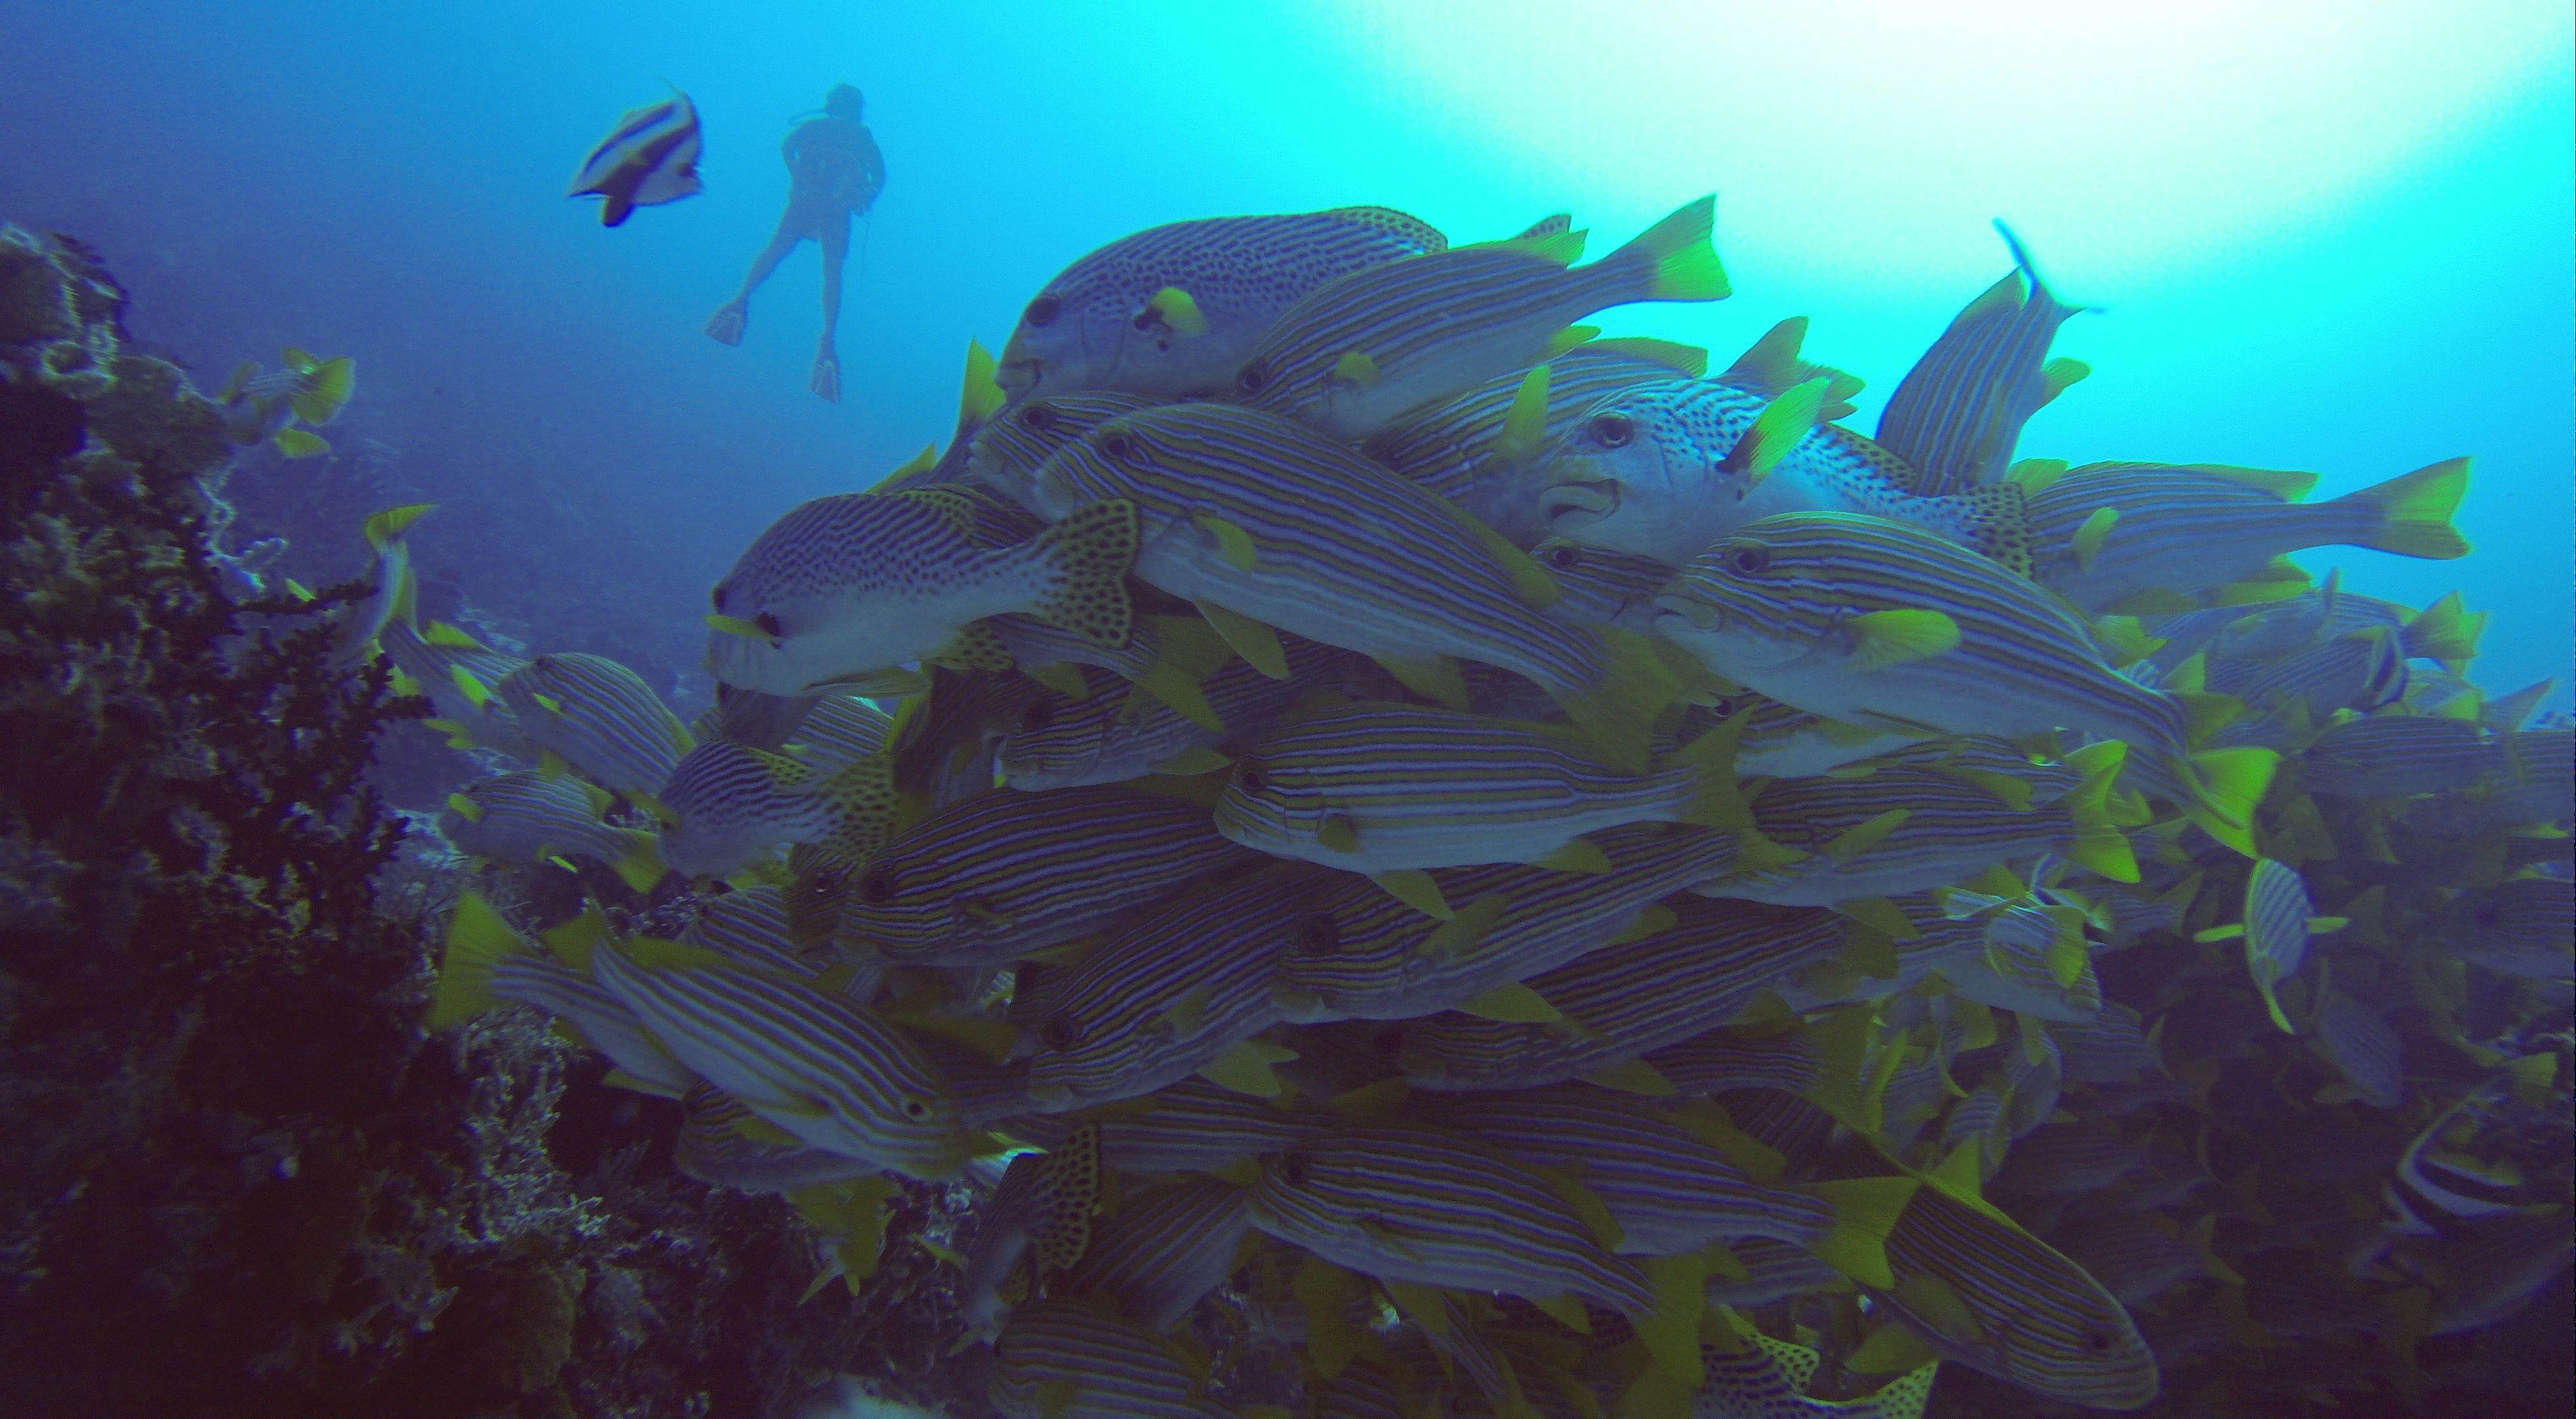 Süßlippenschule und Jutta, Cape Kri, Sorido Bay Resort (Foto aus GoPro-Video)